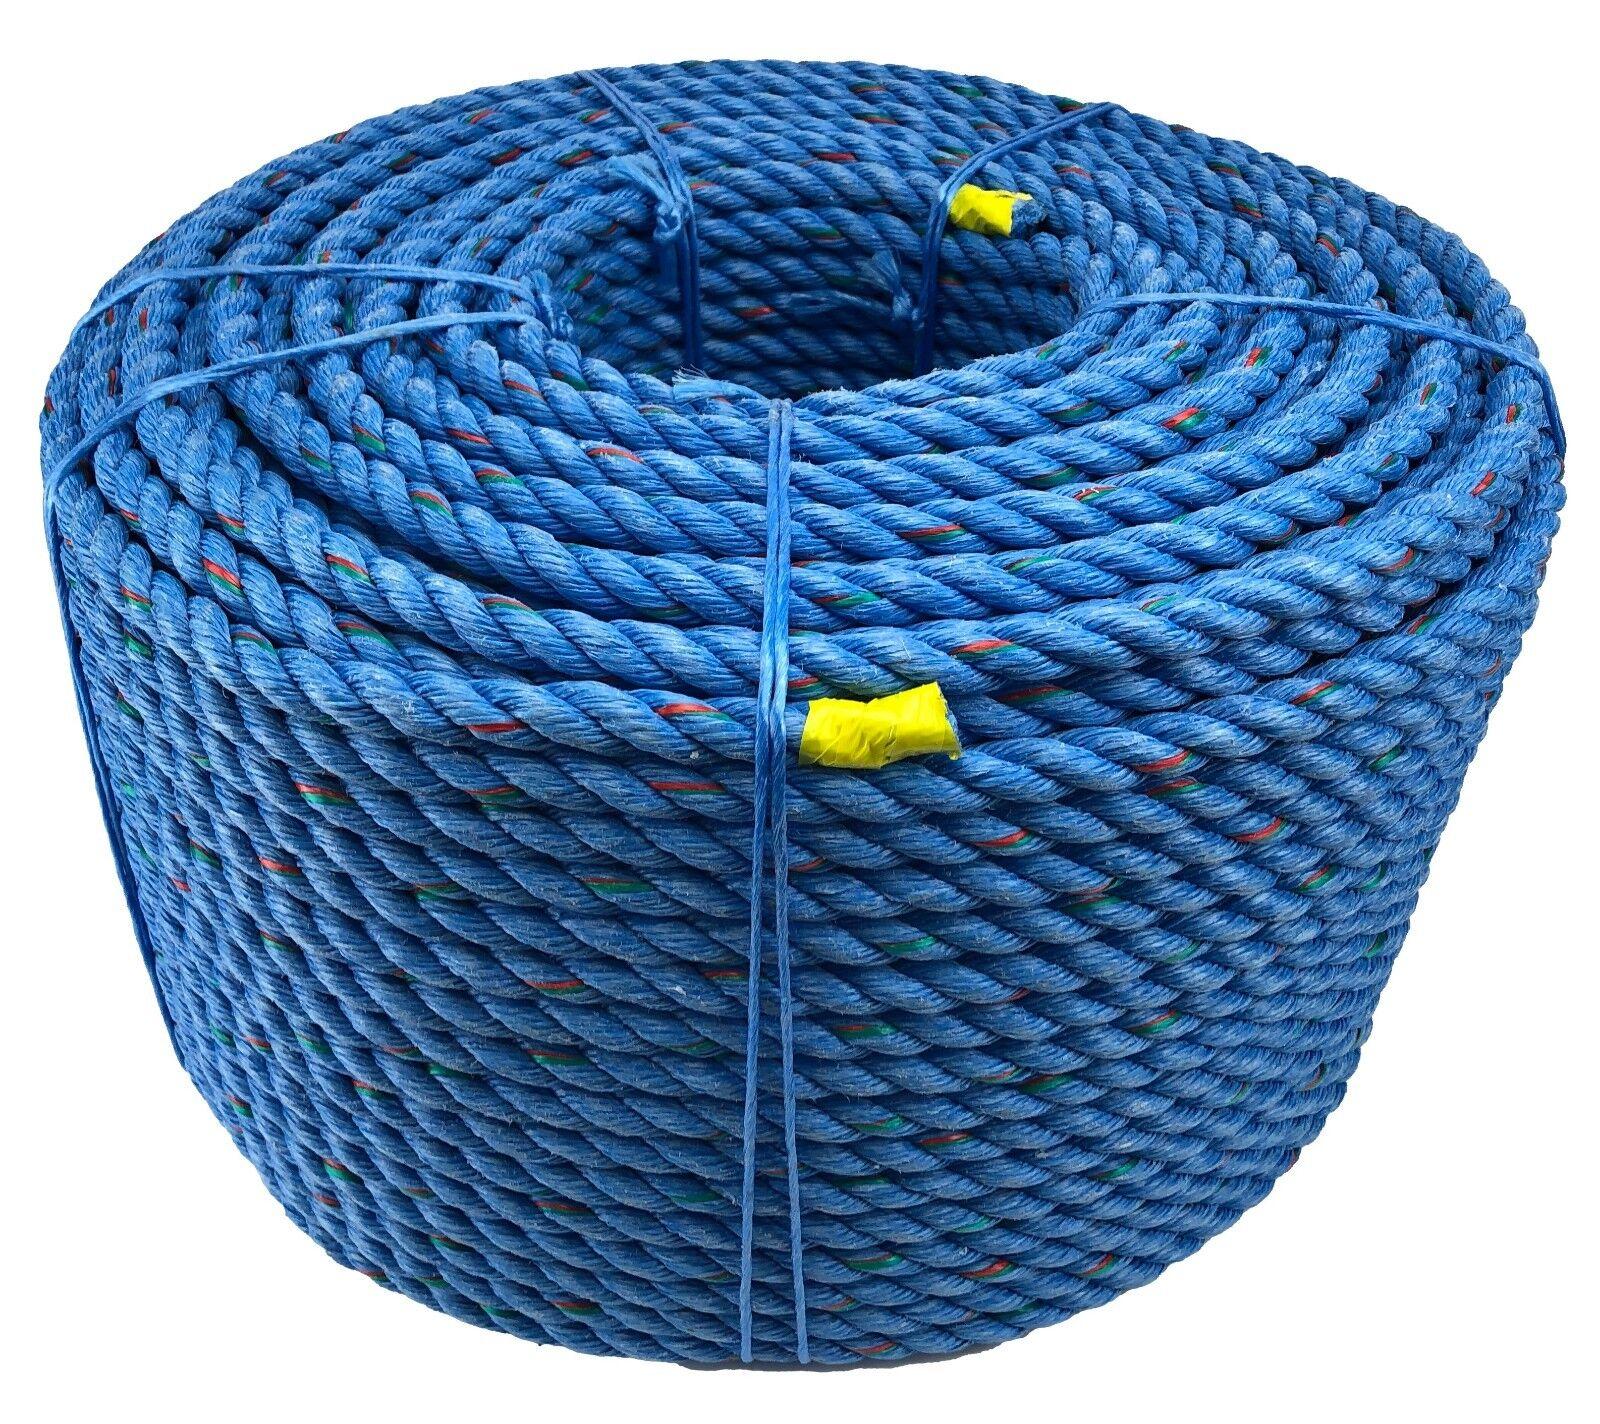 220 Metro Bobina X 16MM Poly Acero Pesca Soporte Cuerda 4x4, Árbol Cirugía